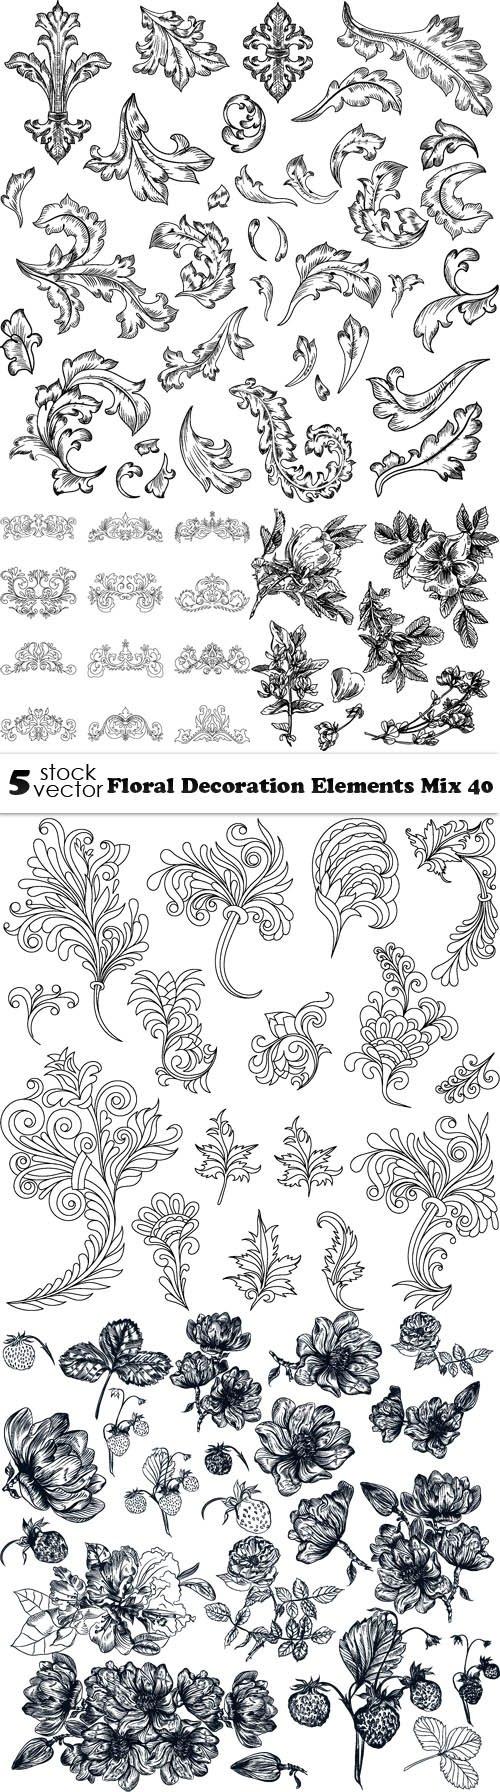 Vectors - Floral Decoration Elements Mix 40